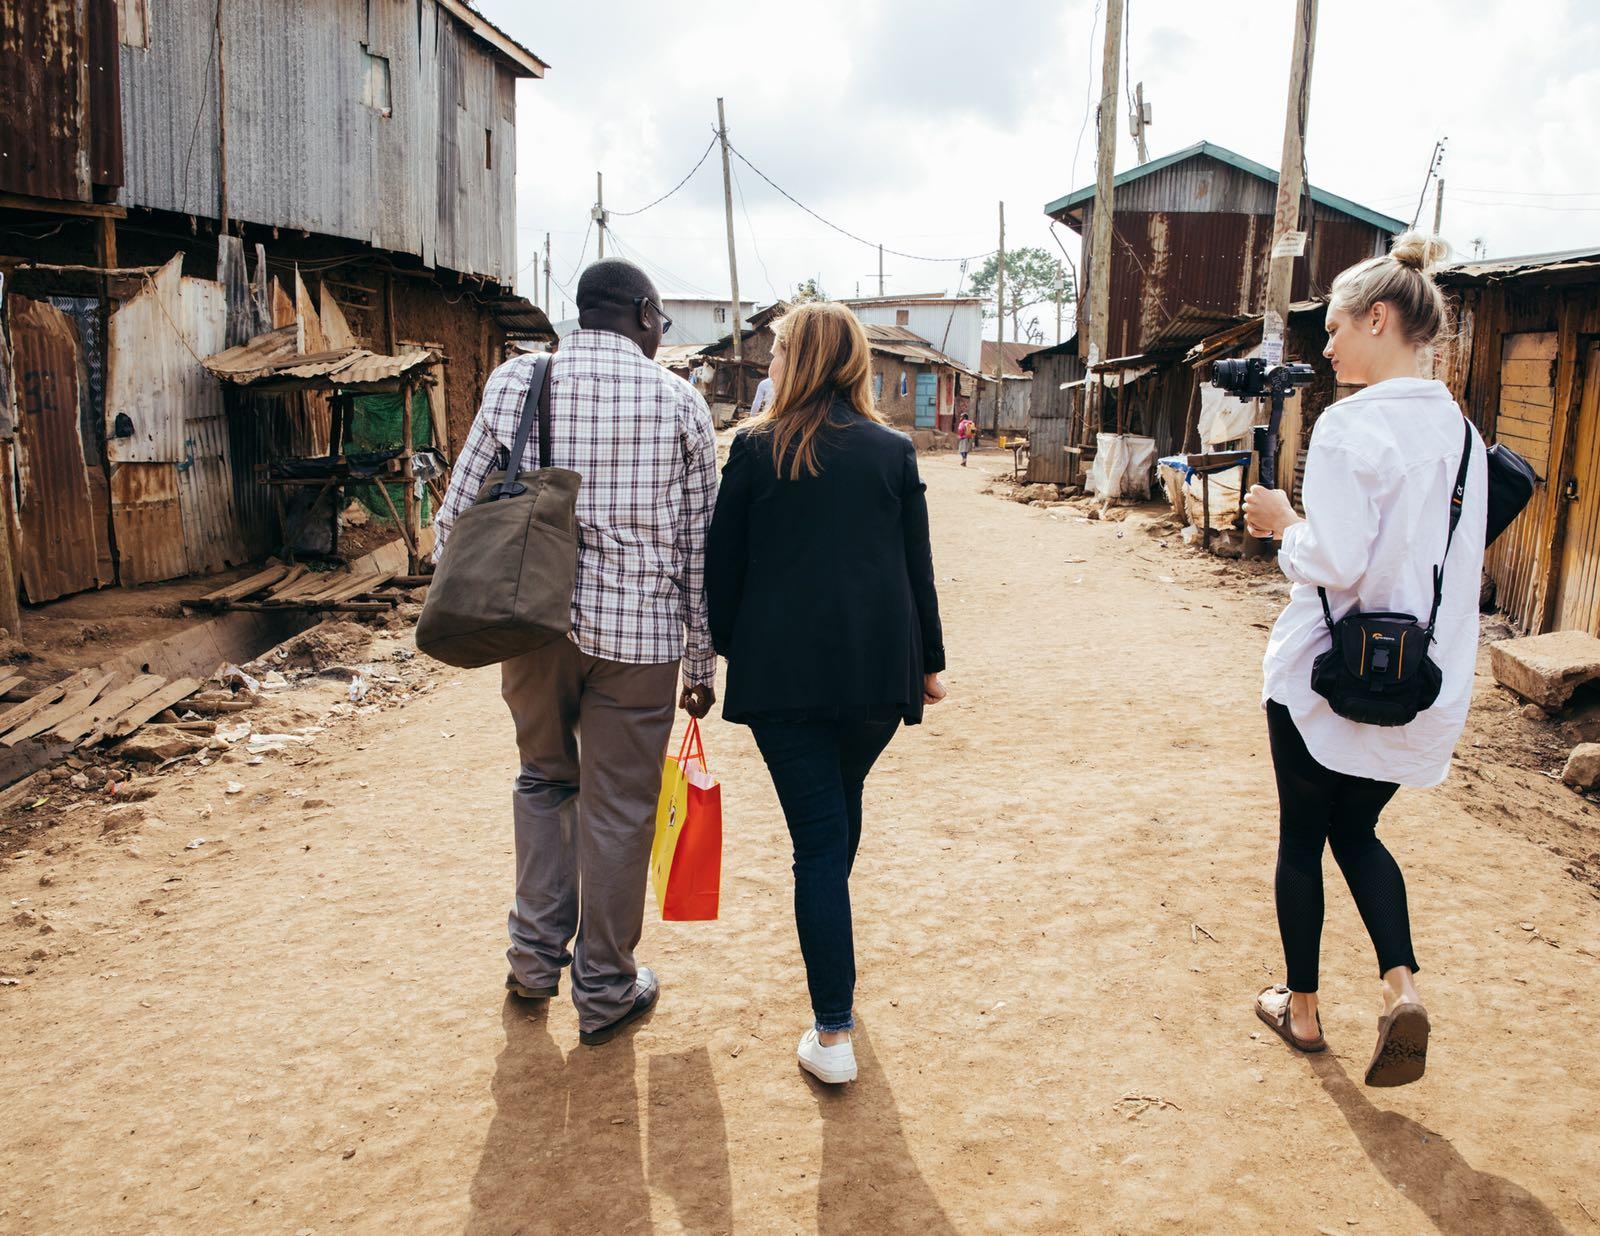 Filming in the Kibera Slum on Day 1